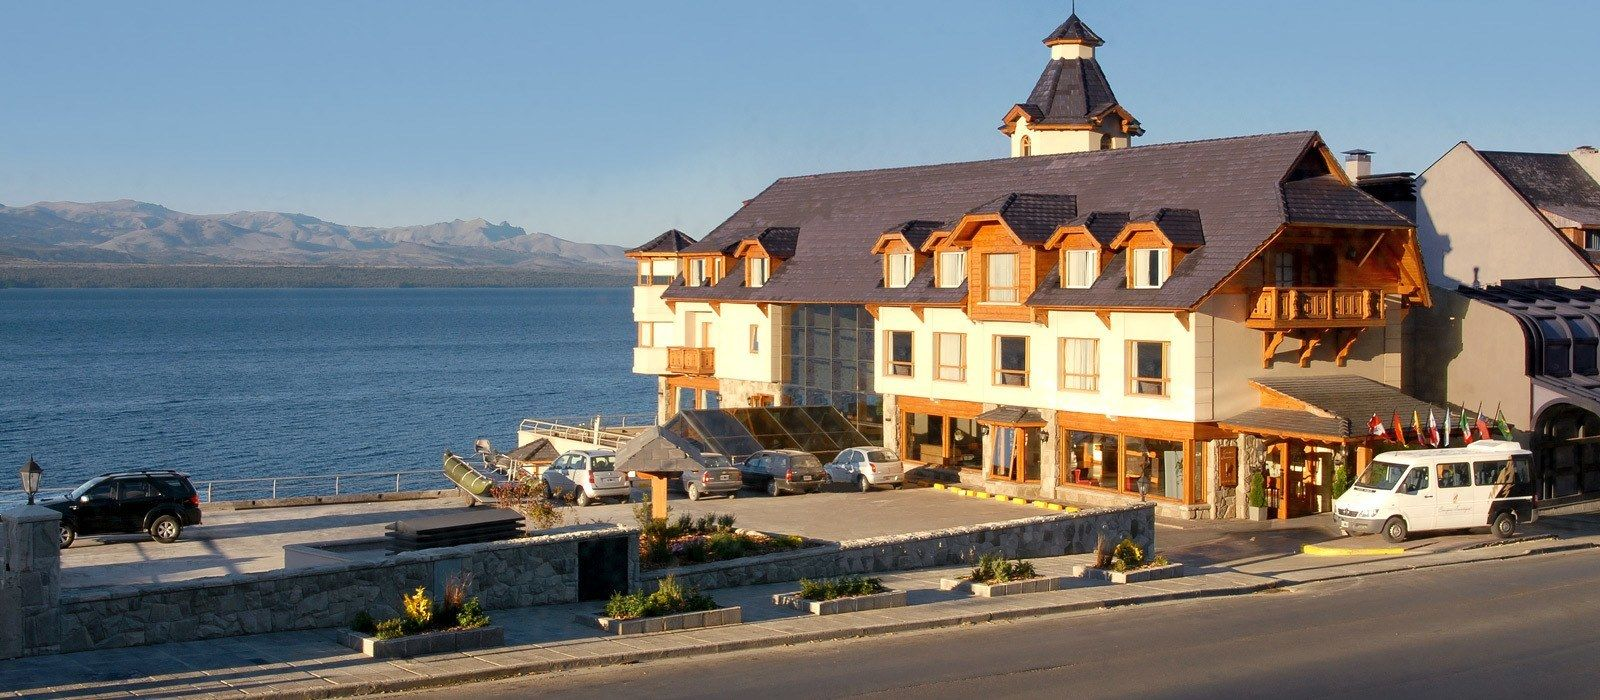 Hotel Cacique Inacayal Argentinien